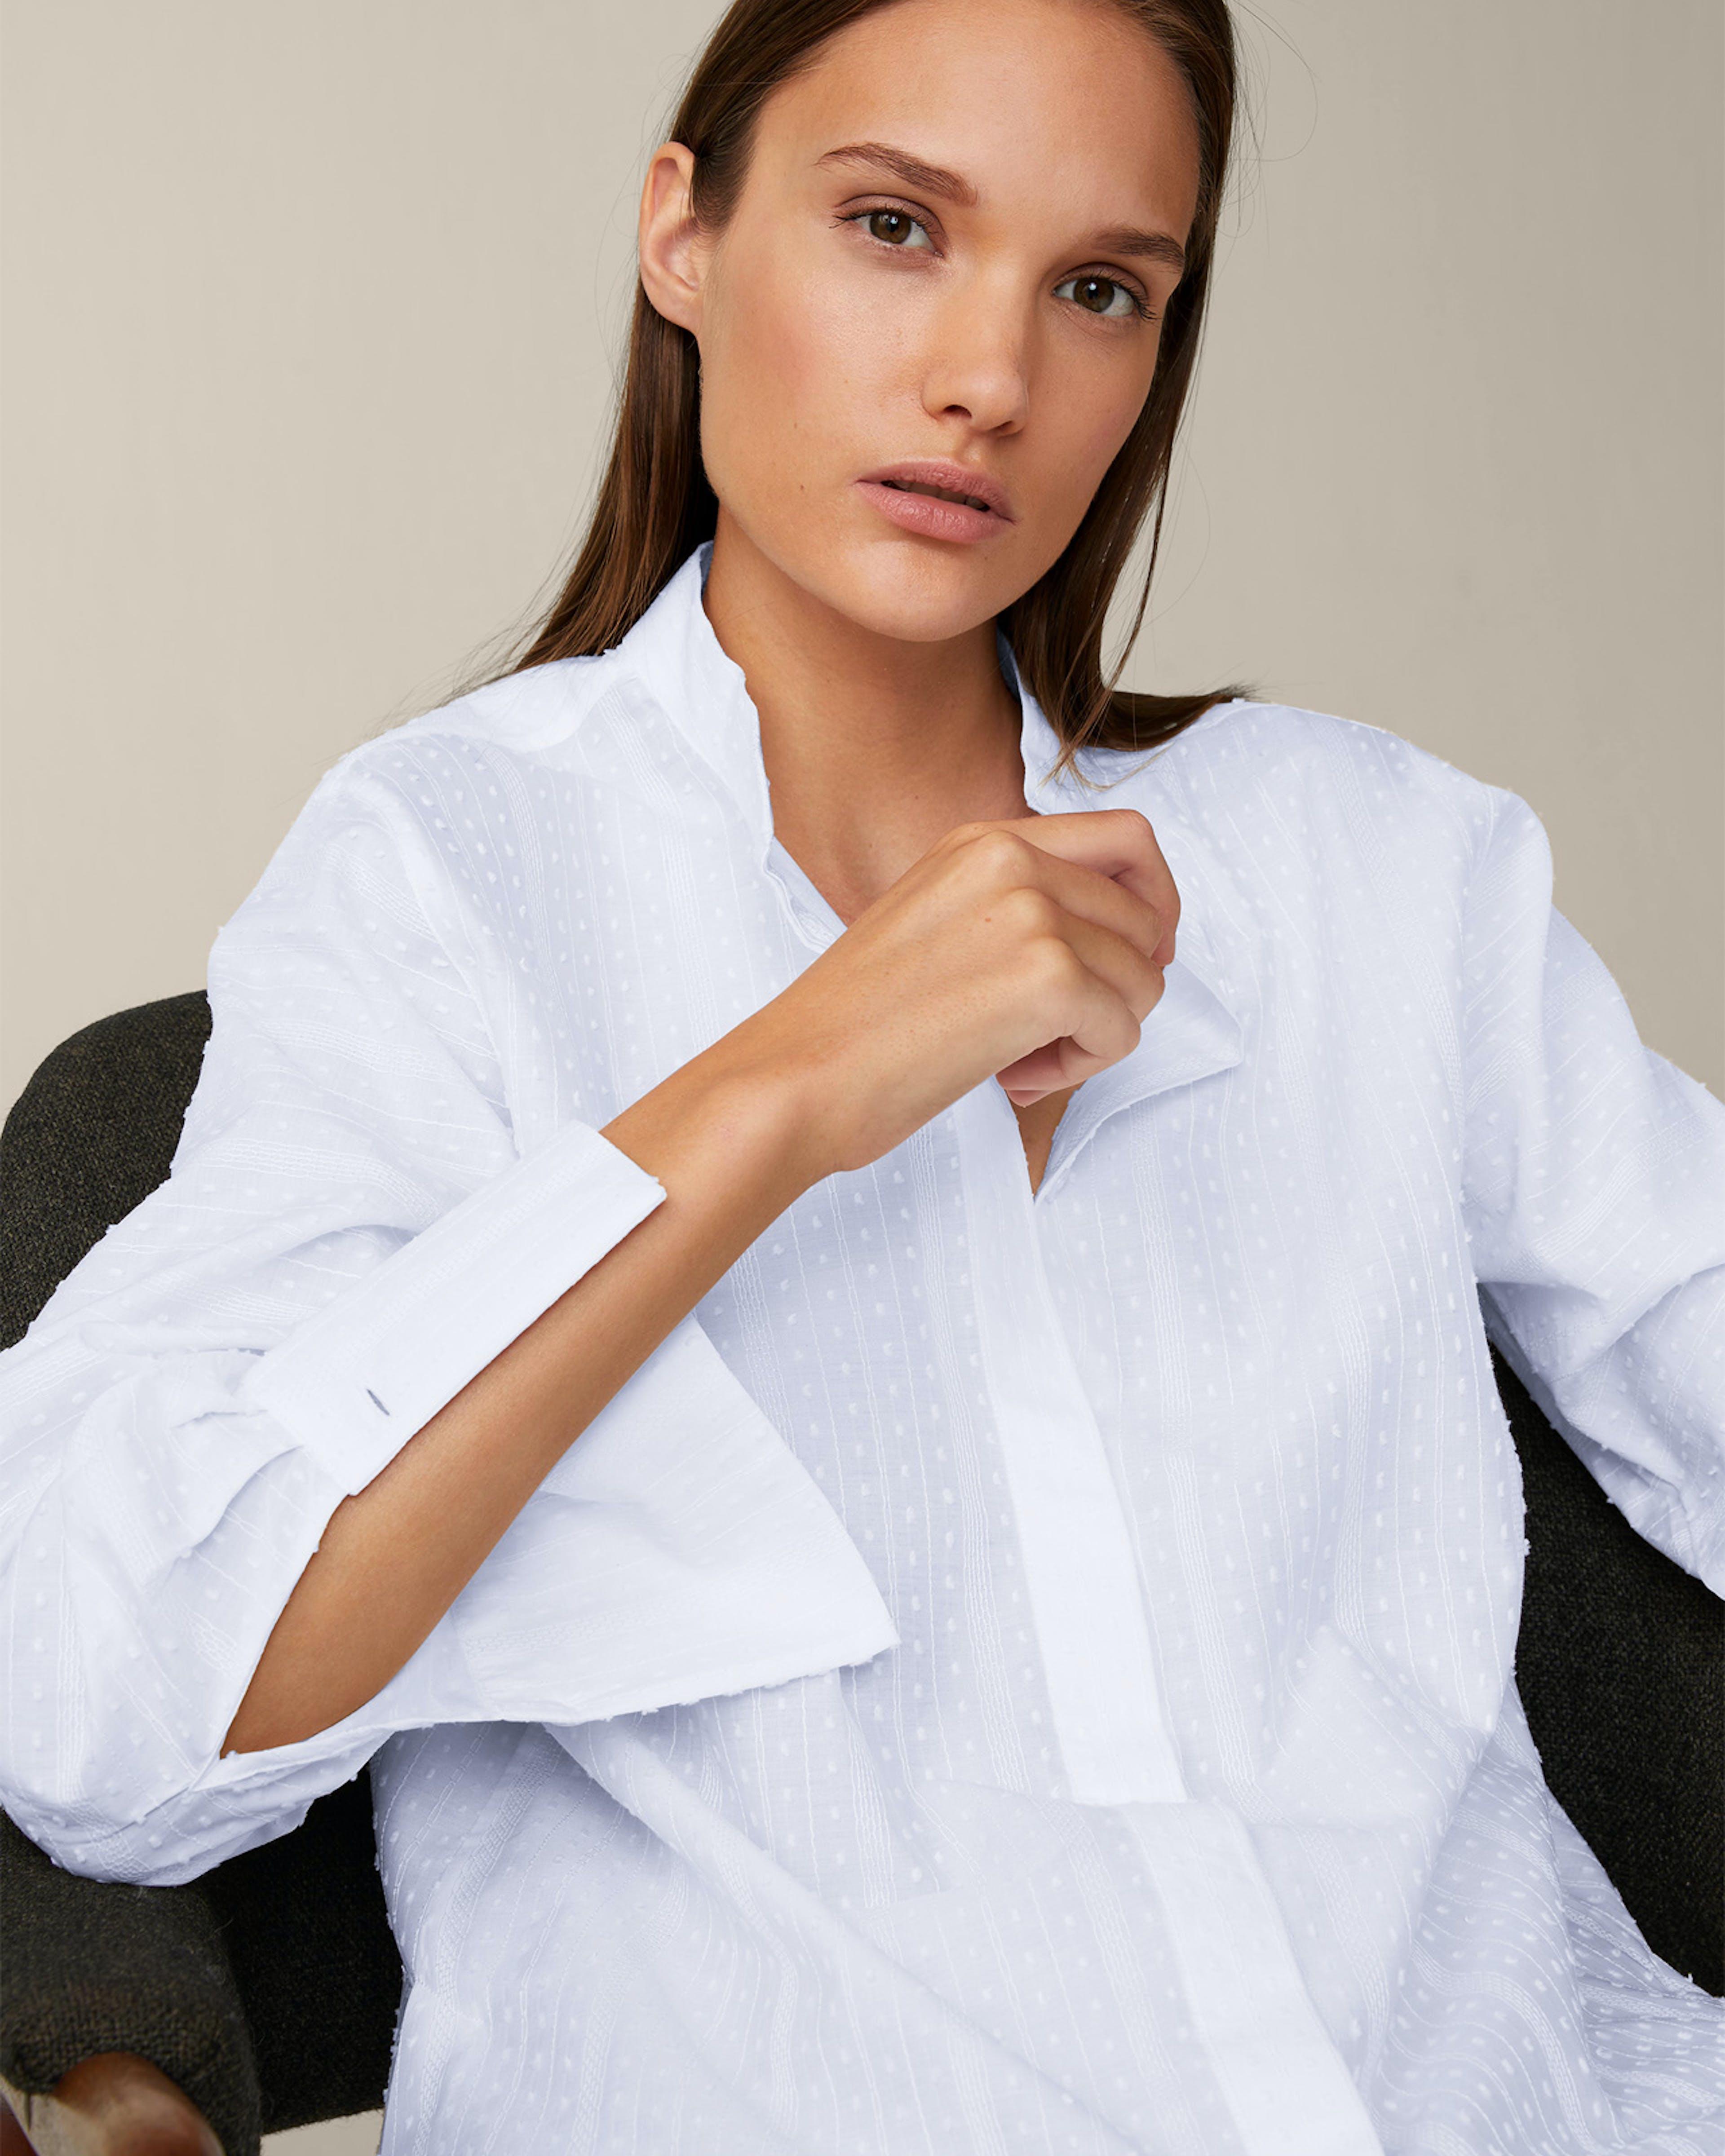 Bluse aus Baumwoll-Batist-Fil-Coupé in Weiss